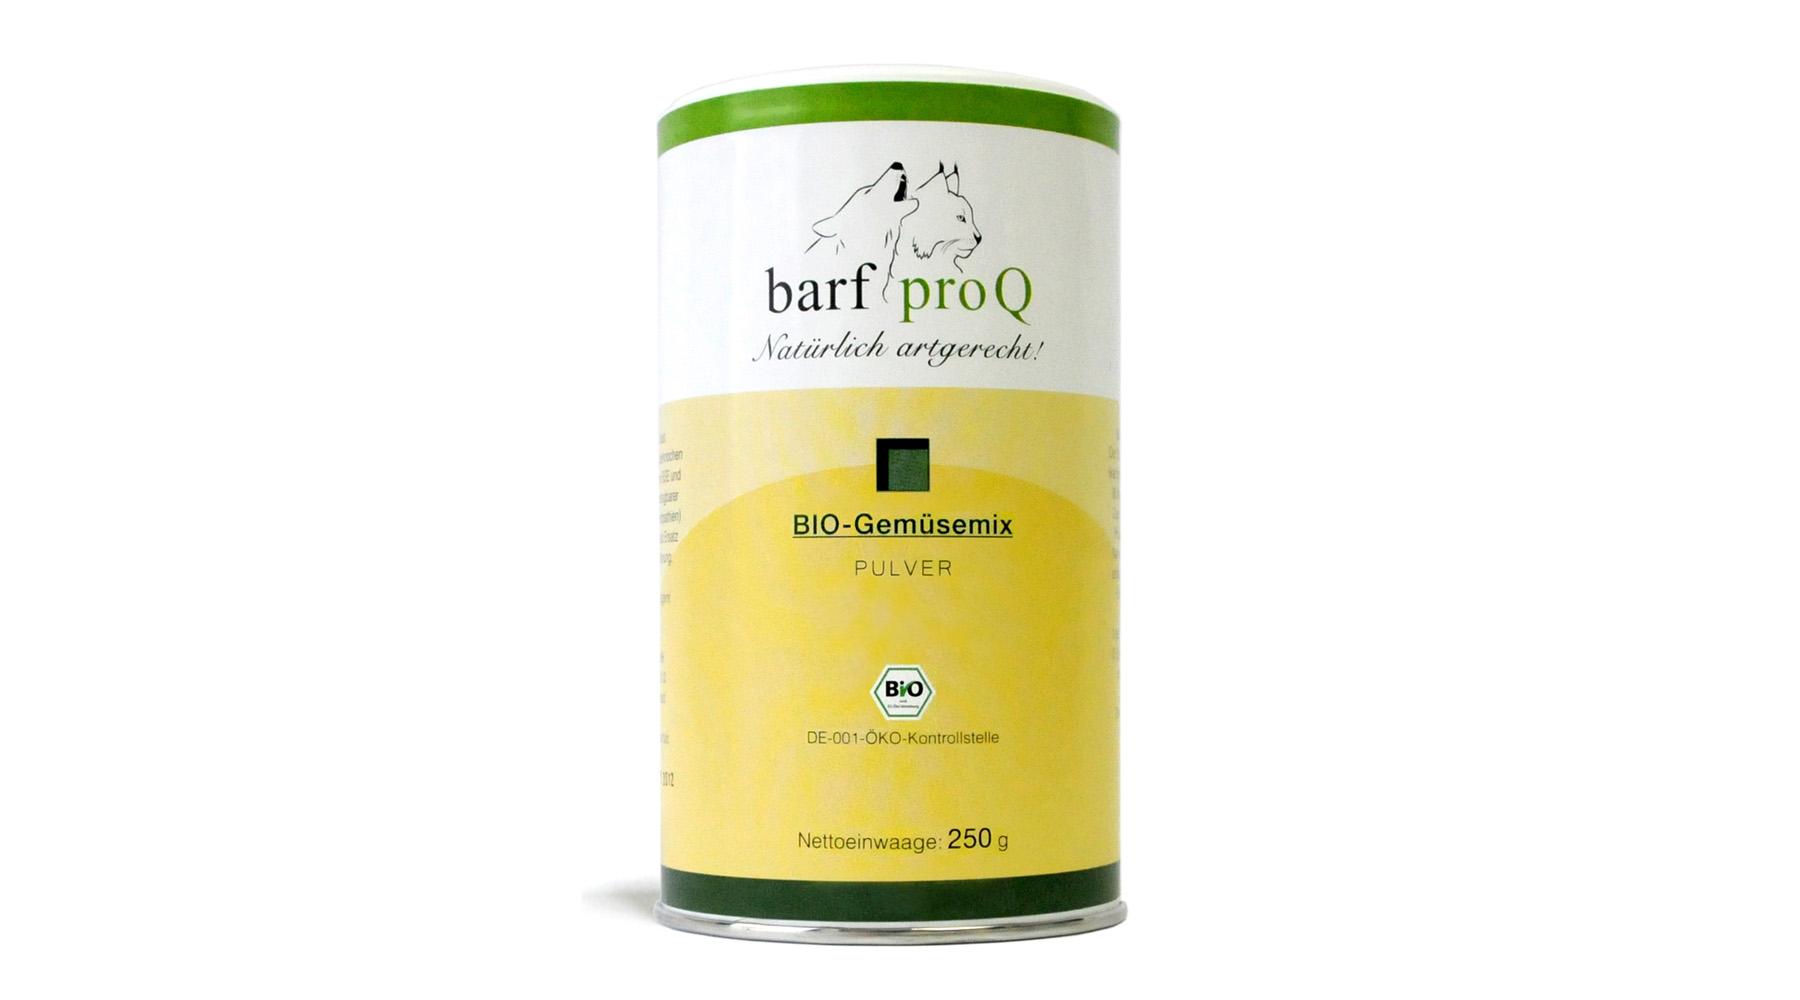 Barf proQ Bio-Gemüsemix